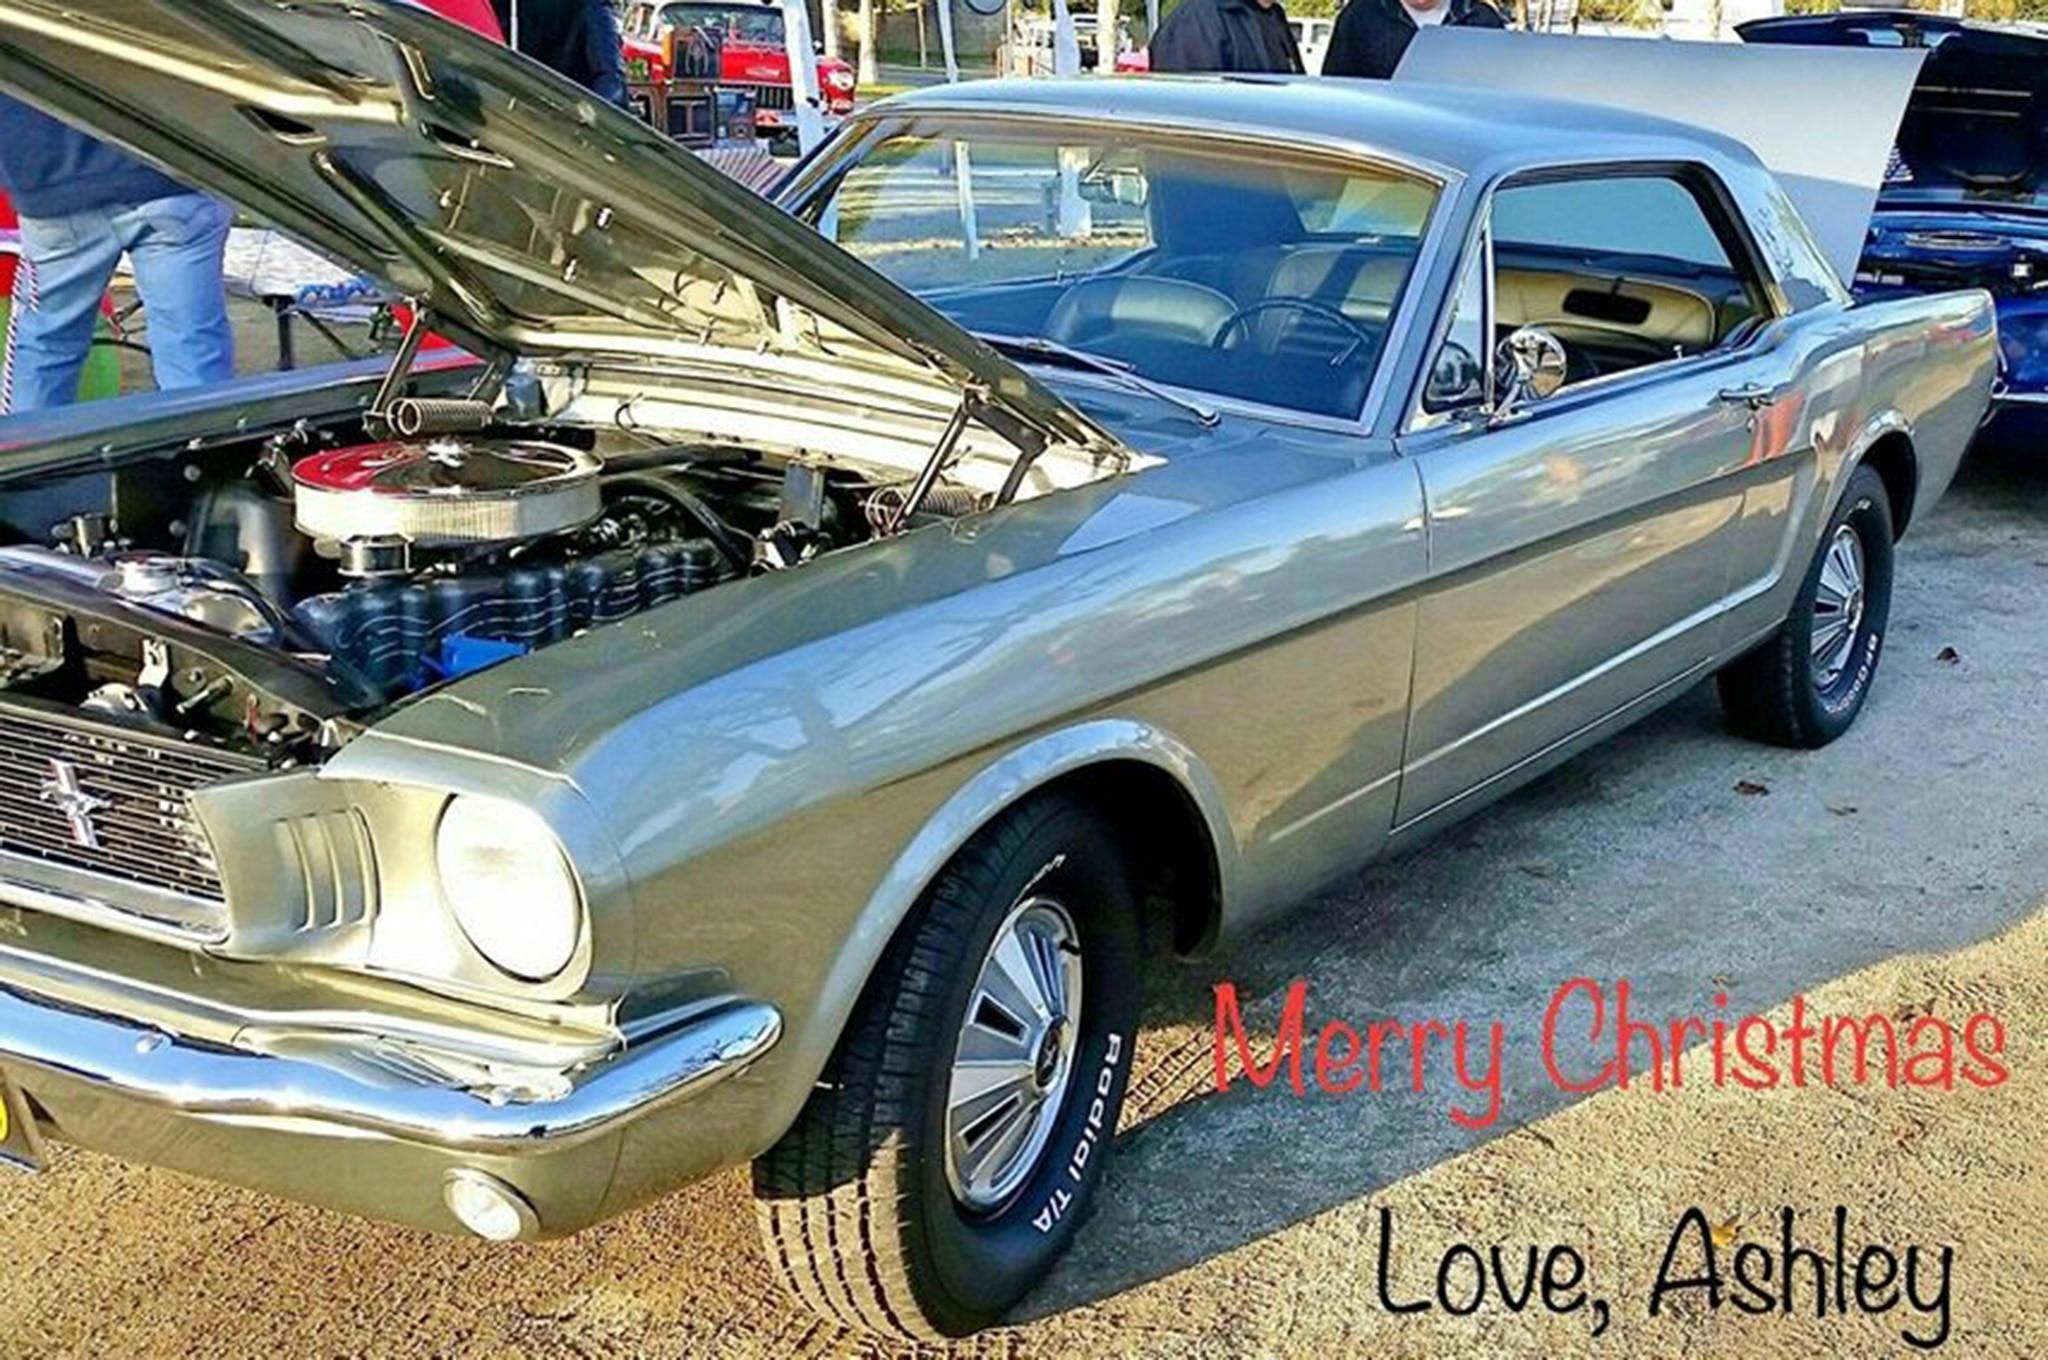 001 1966 Mustang Ashley RSD Bakersfield